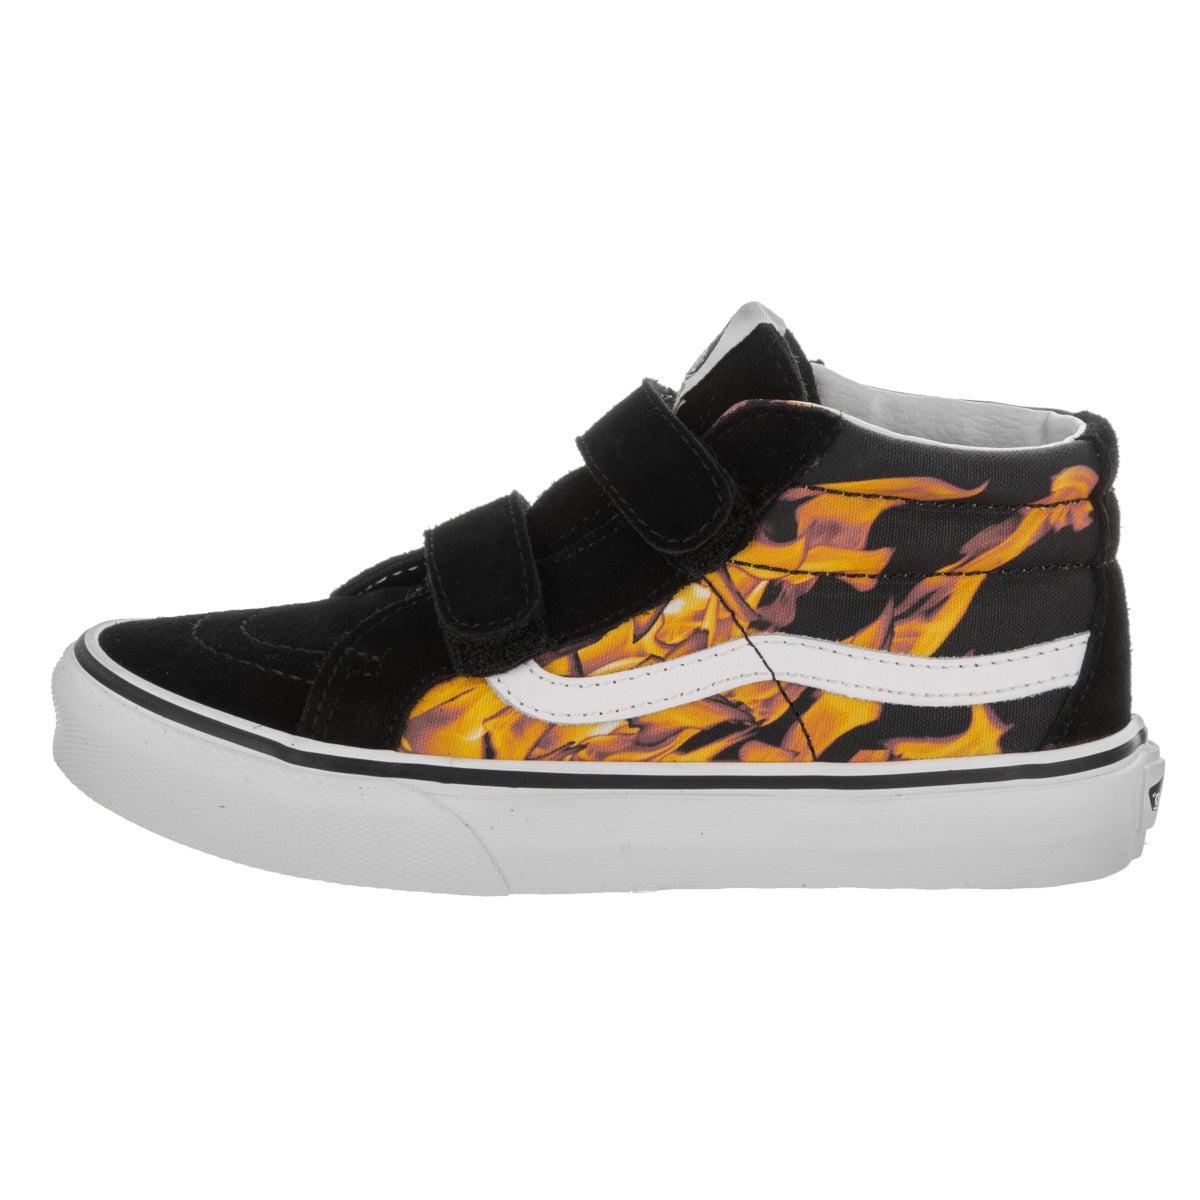 bb3dbeee44 Shop Vans Kids Sk8-Mid Reissue V (Digi Flame) Skate Shoe - Free Shipping On  Orders Over  45 - Overstock - 14676658